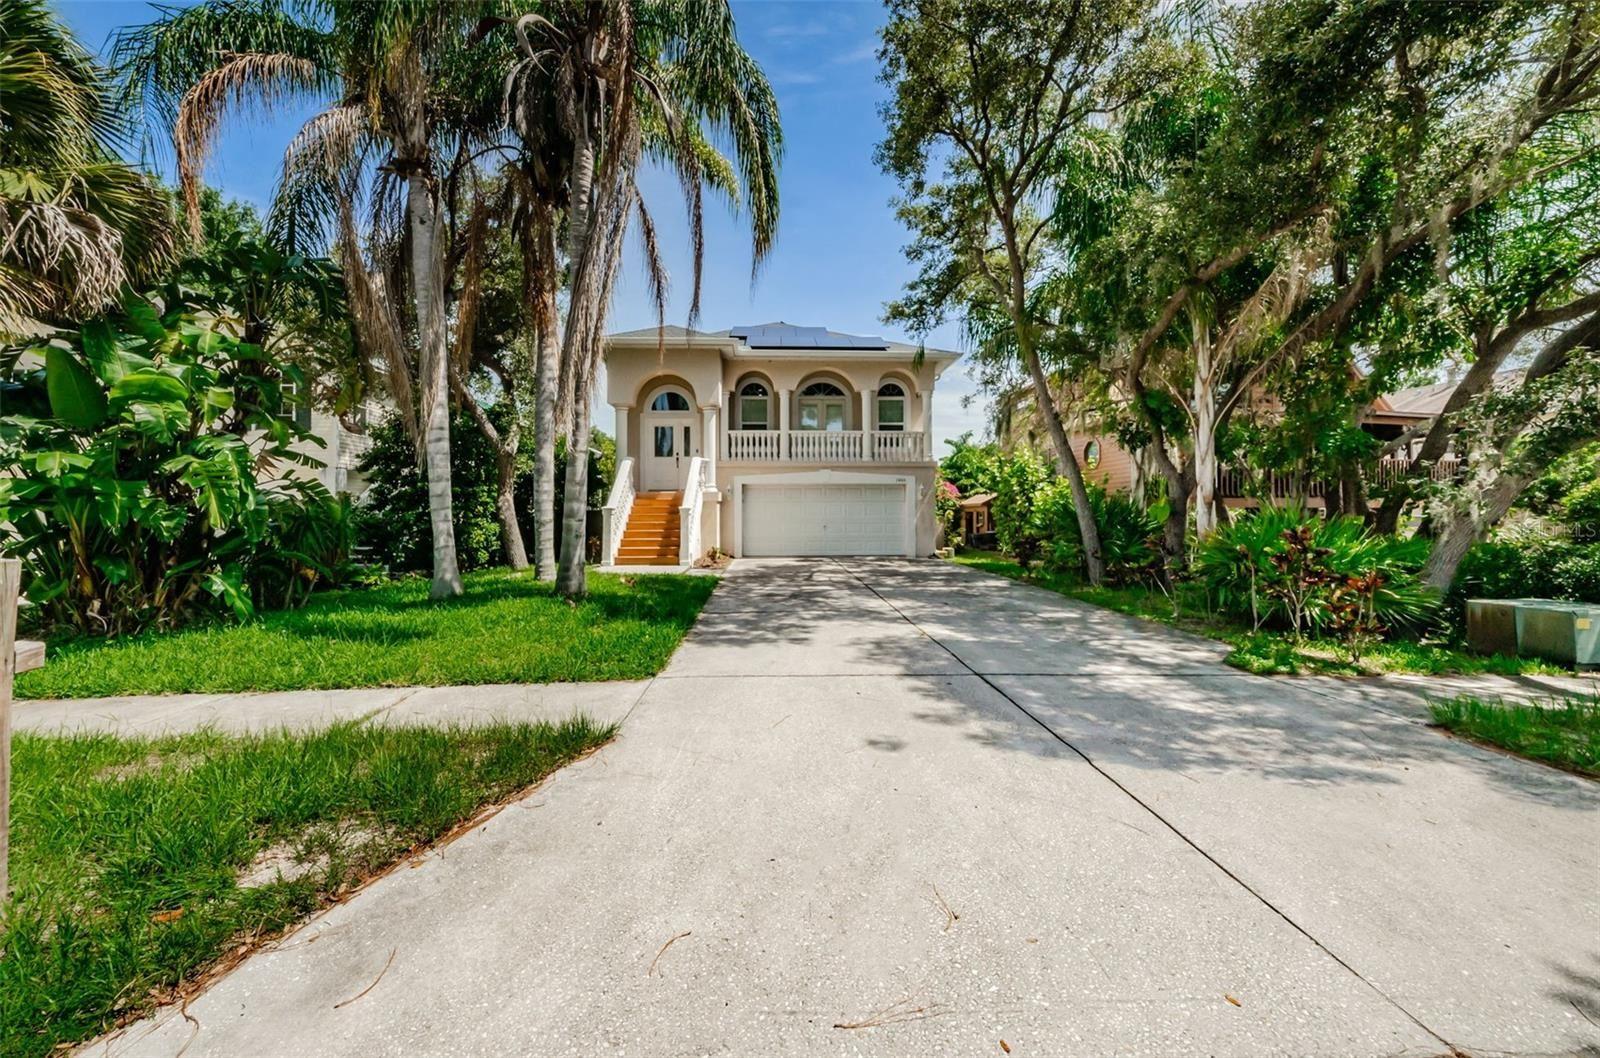 1406 POINSETTIA AVENUE, Tarpon Springs, FL 34689 - MLS#: U8129530